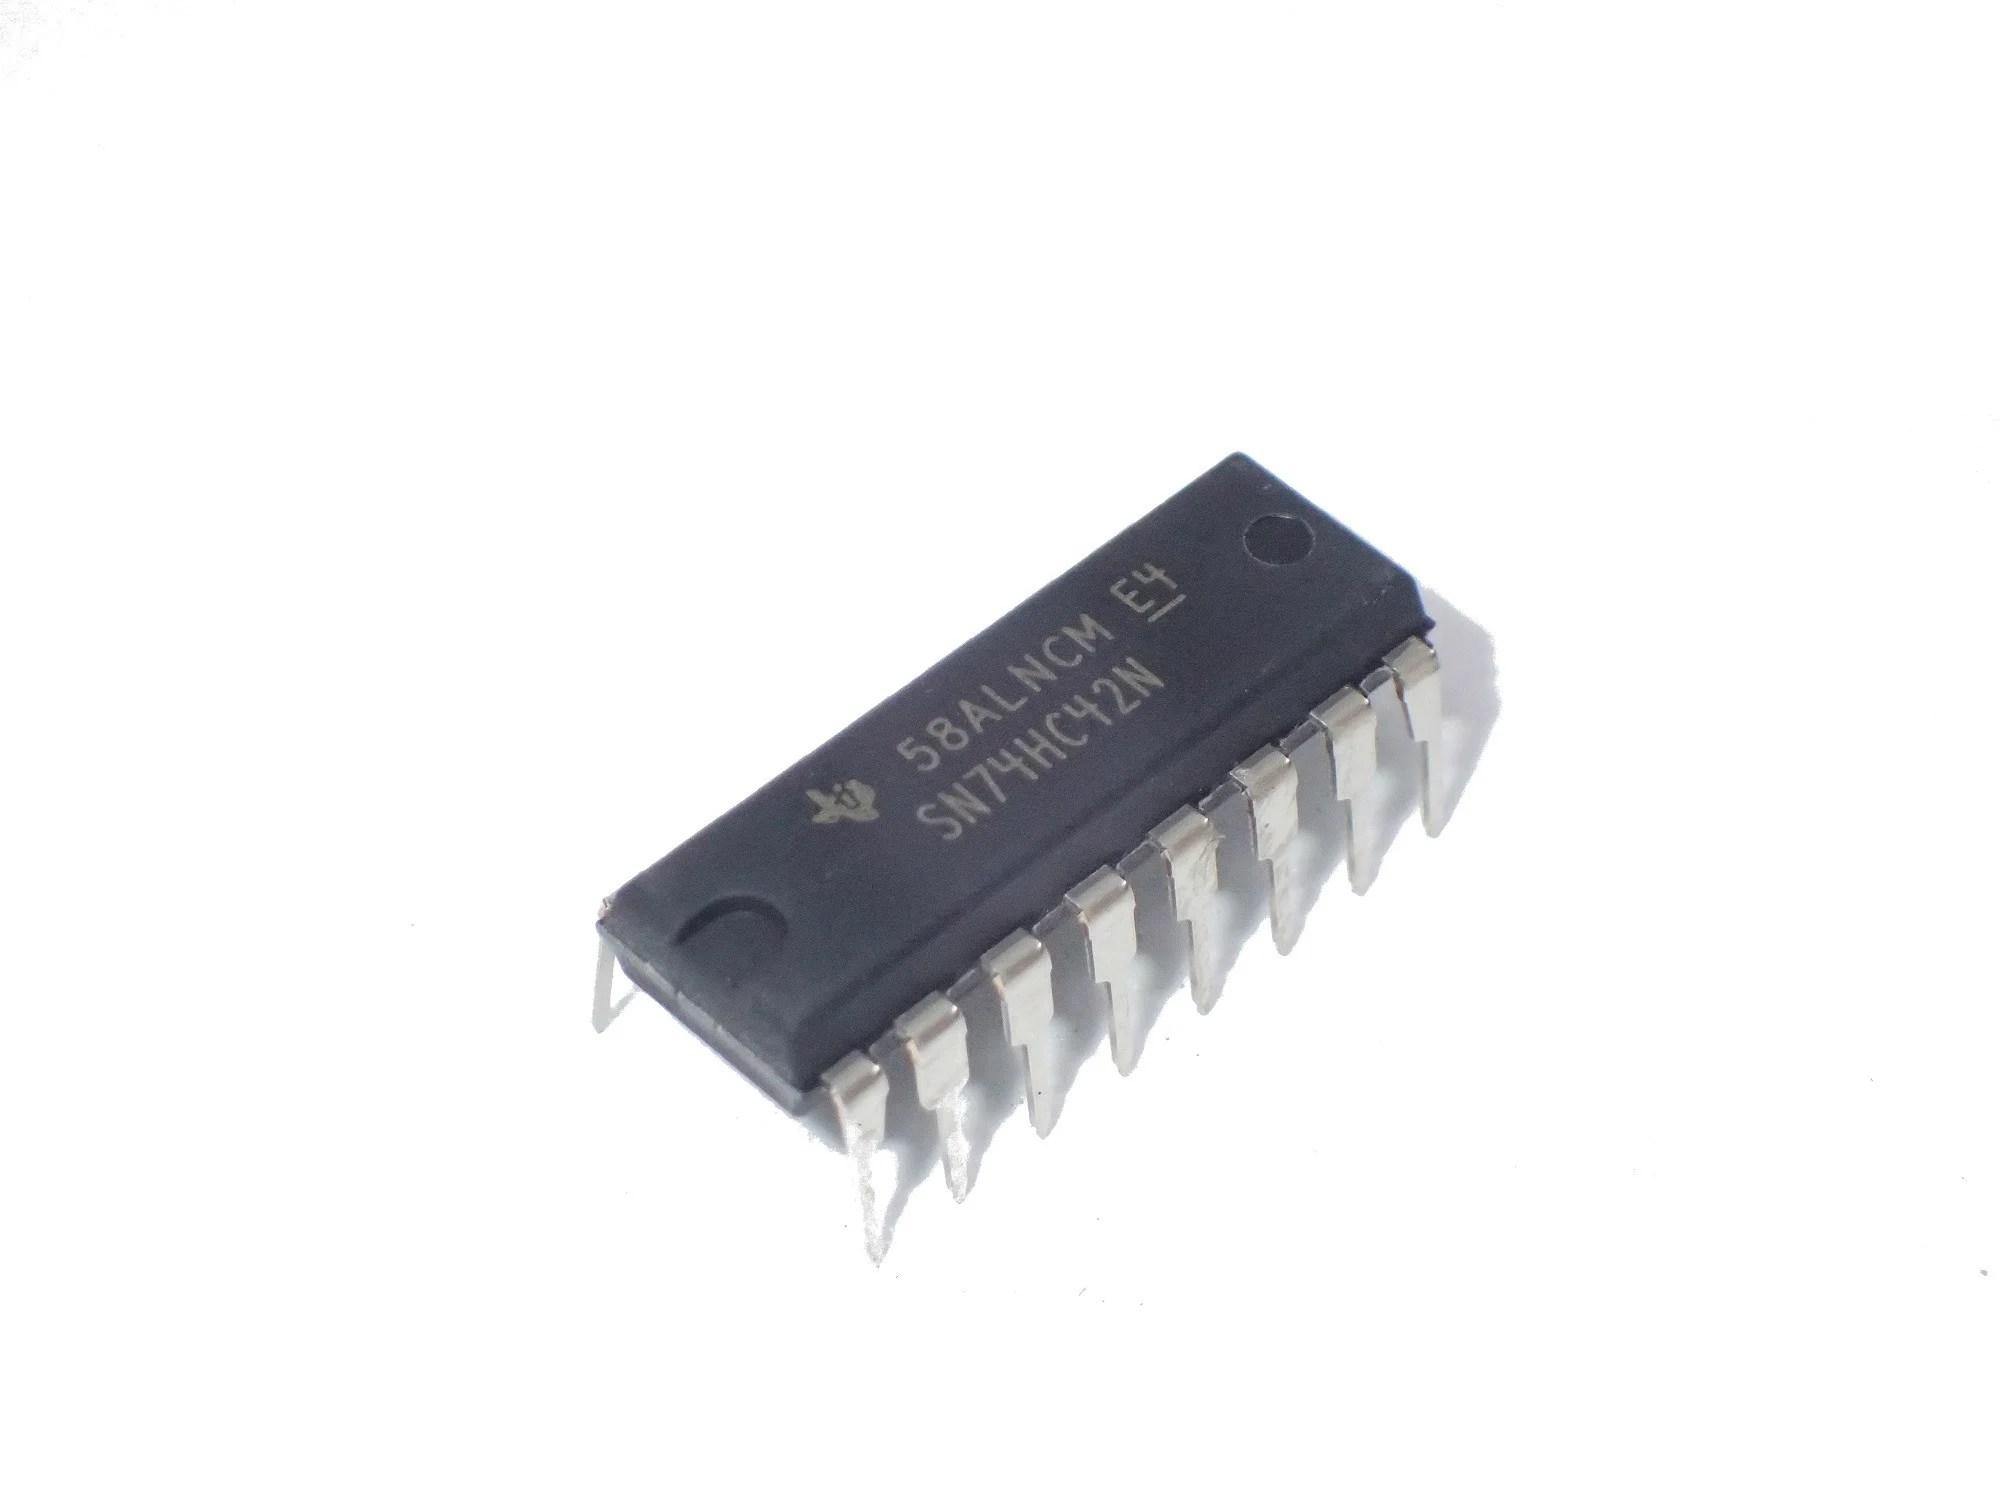 medium resolution of sn74hc42n bcd to decimal decoder 10 output 5 2 ma 2 v to 6 v dip 16 x 2pcs